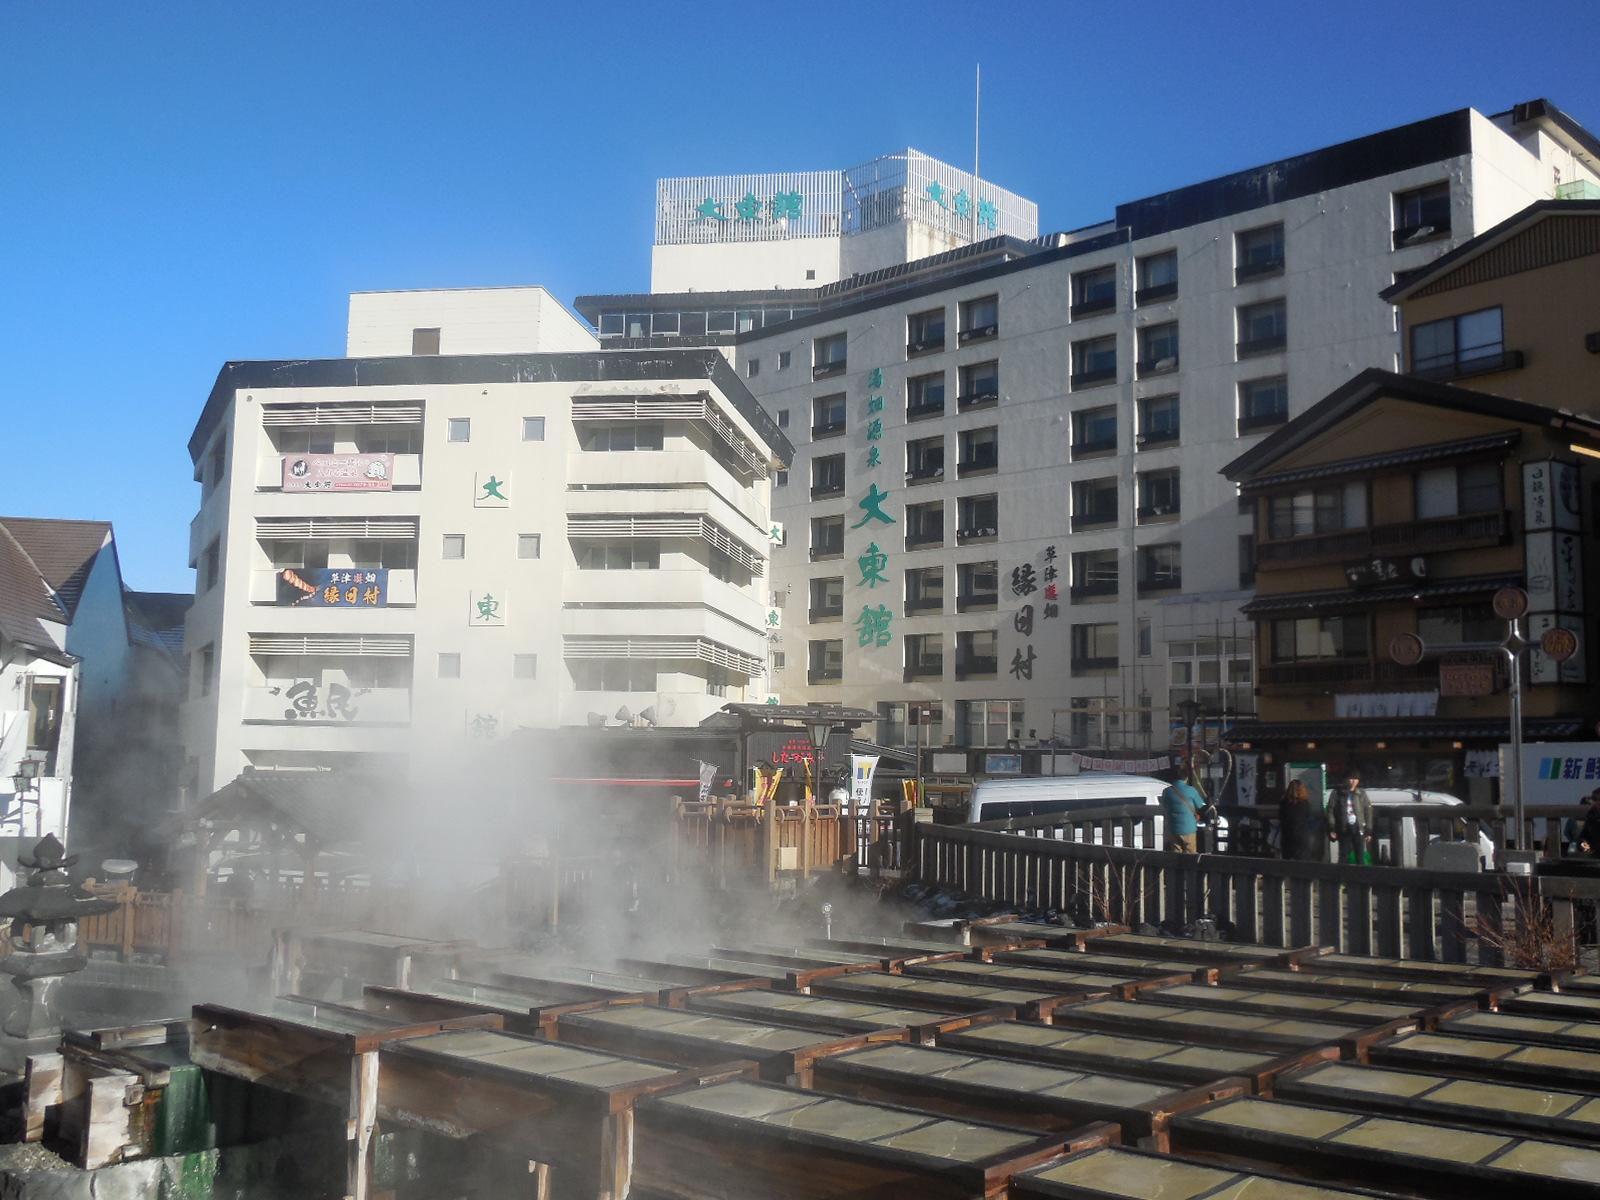 Kusatsu Onsen Daitokan